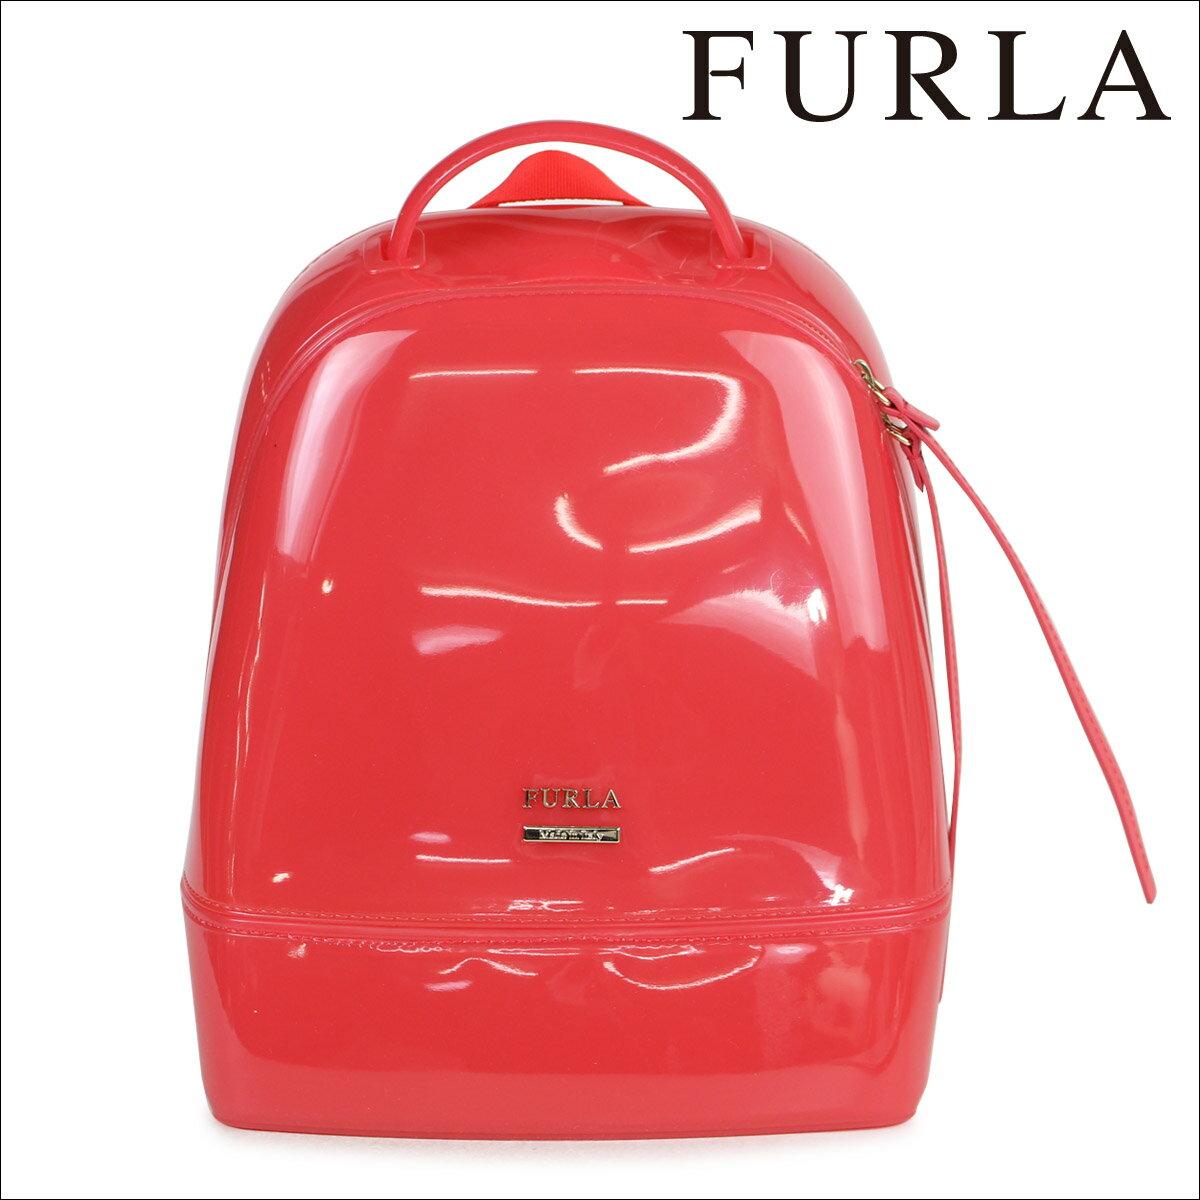 FURLA フルラ バッグ リュック バックパック レディース ピンク CANDY S BACK PACK RPSA 885218